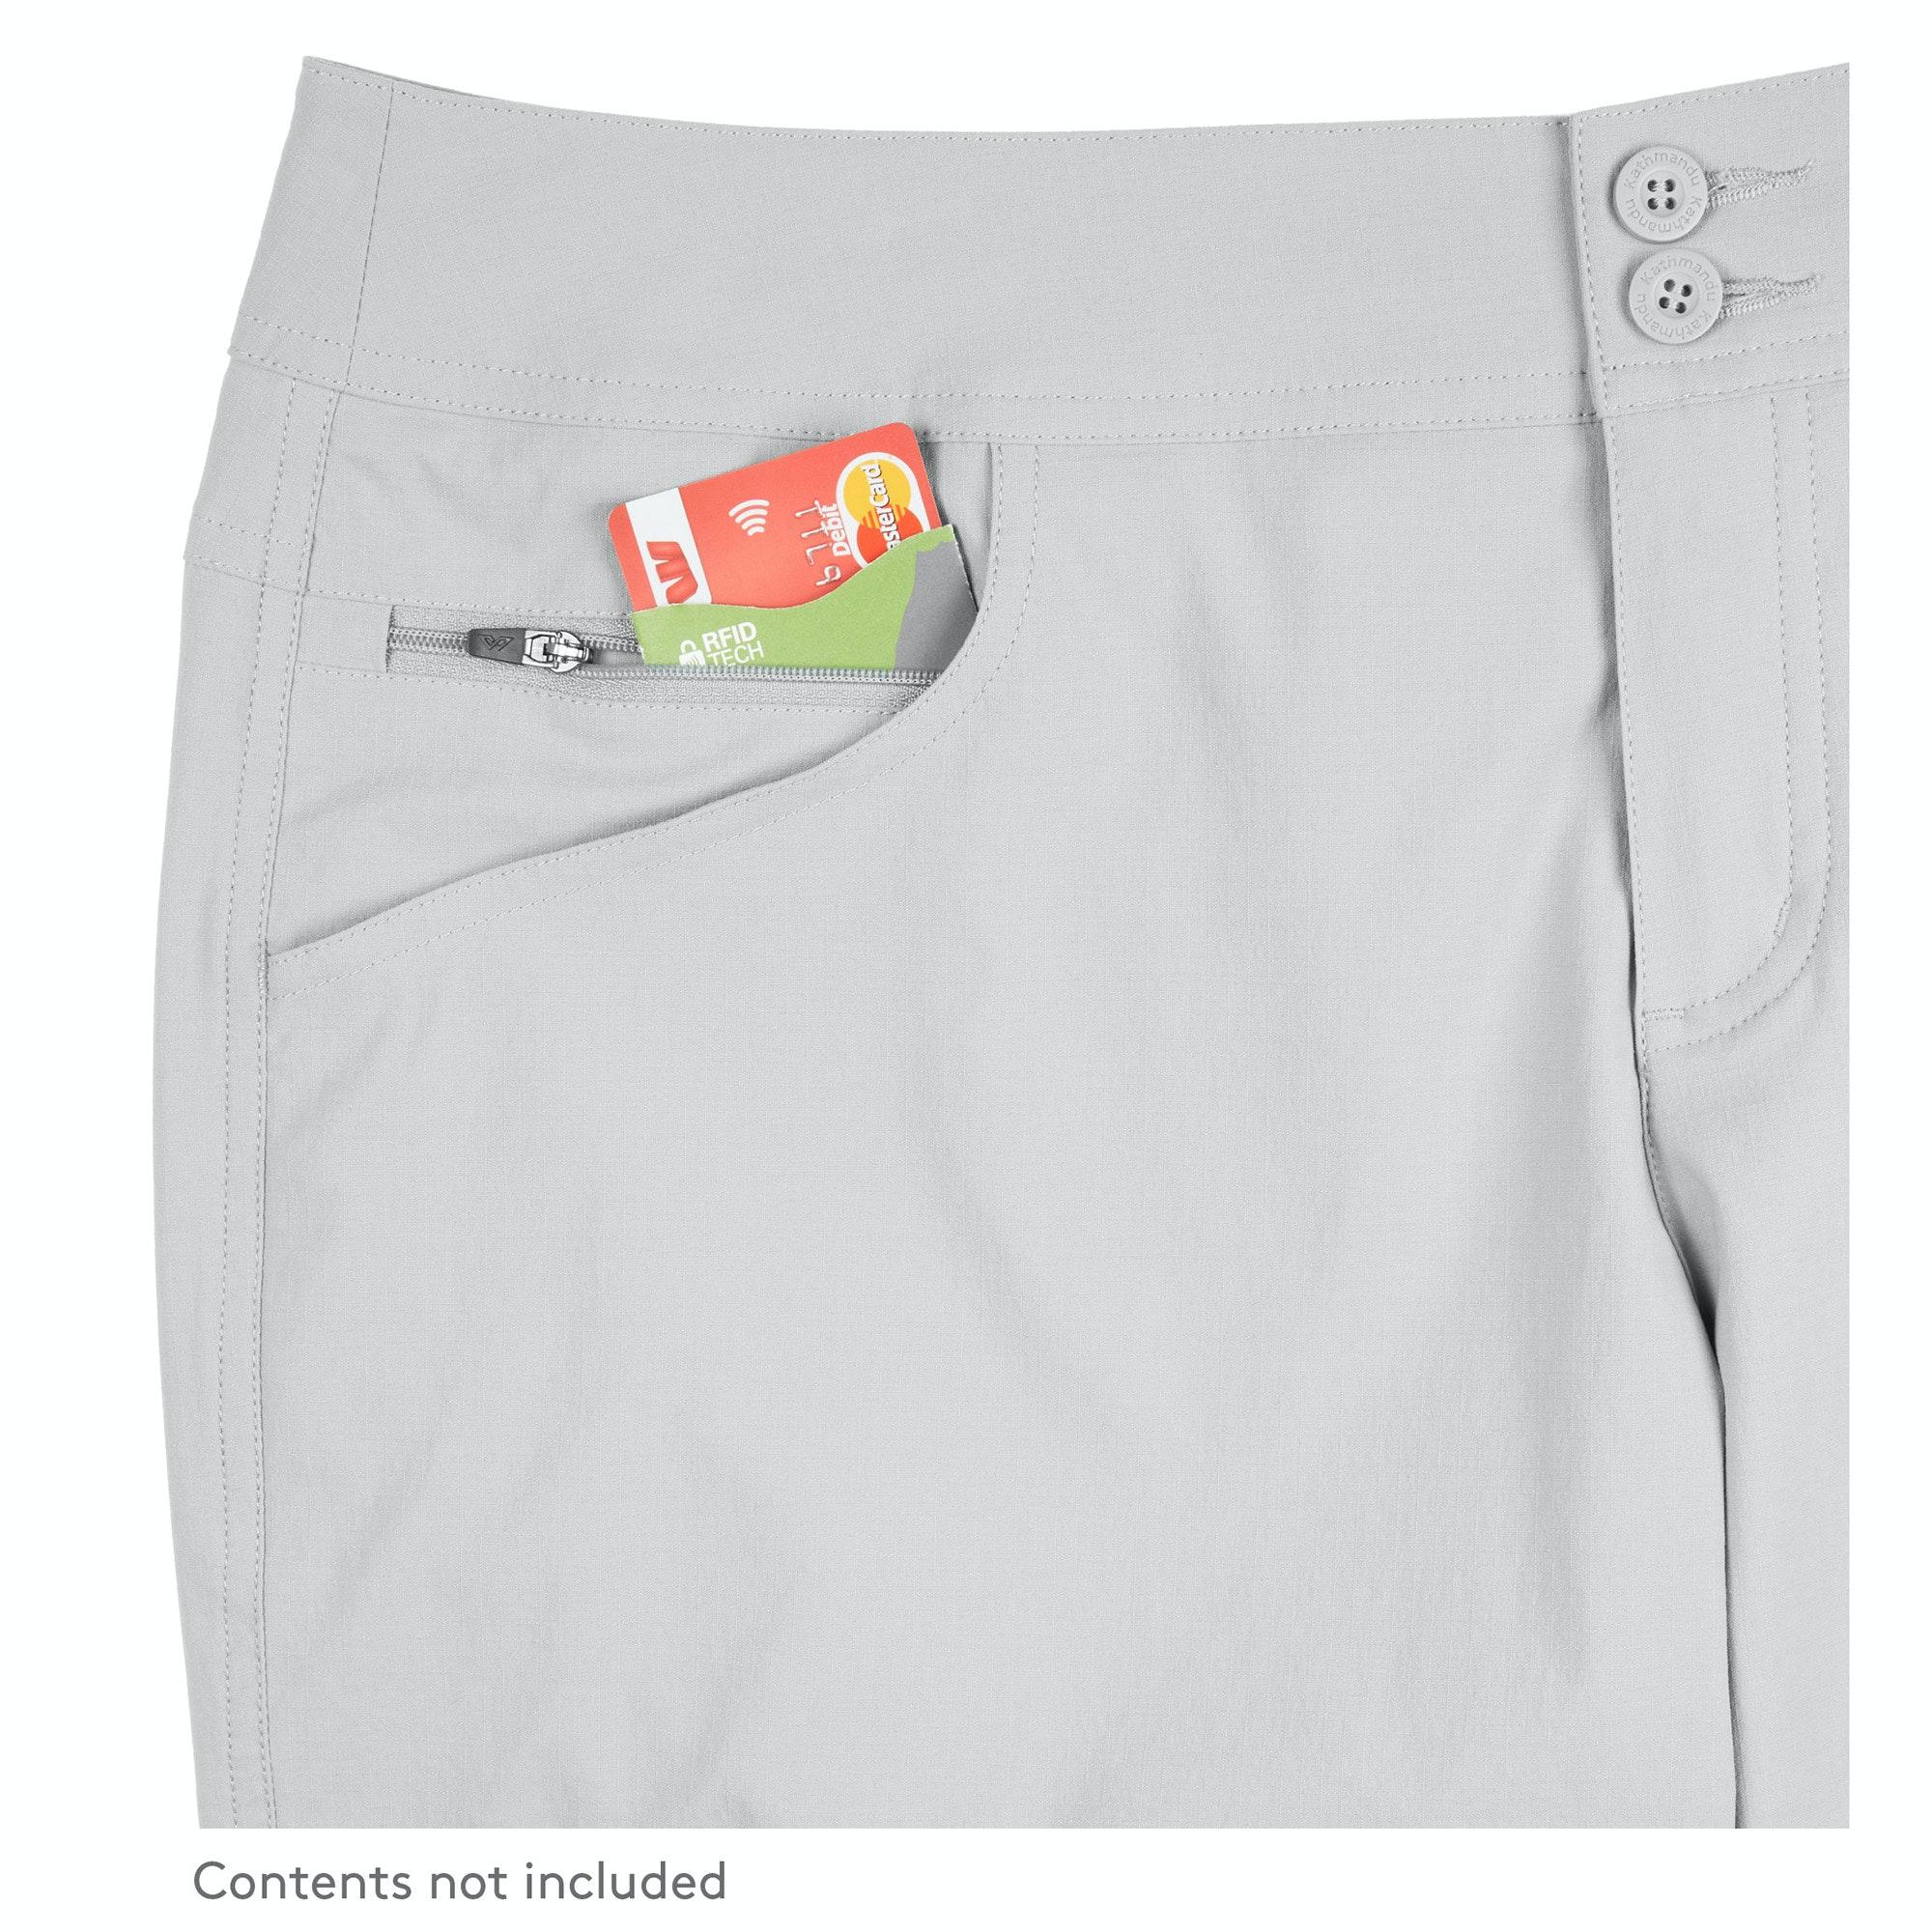 295223e0c49b Kathmandu Maraba Womens Slim Fit Quick Drying Travel Hiking Shorts v2